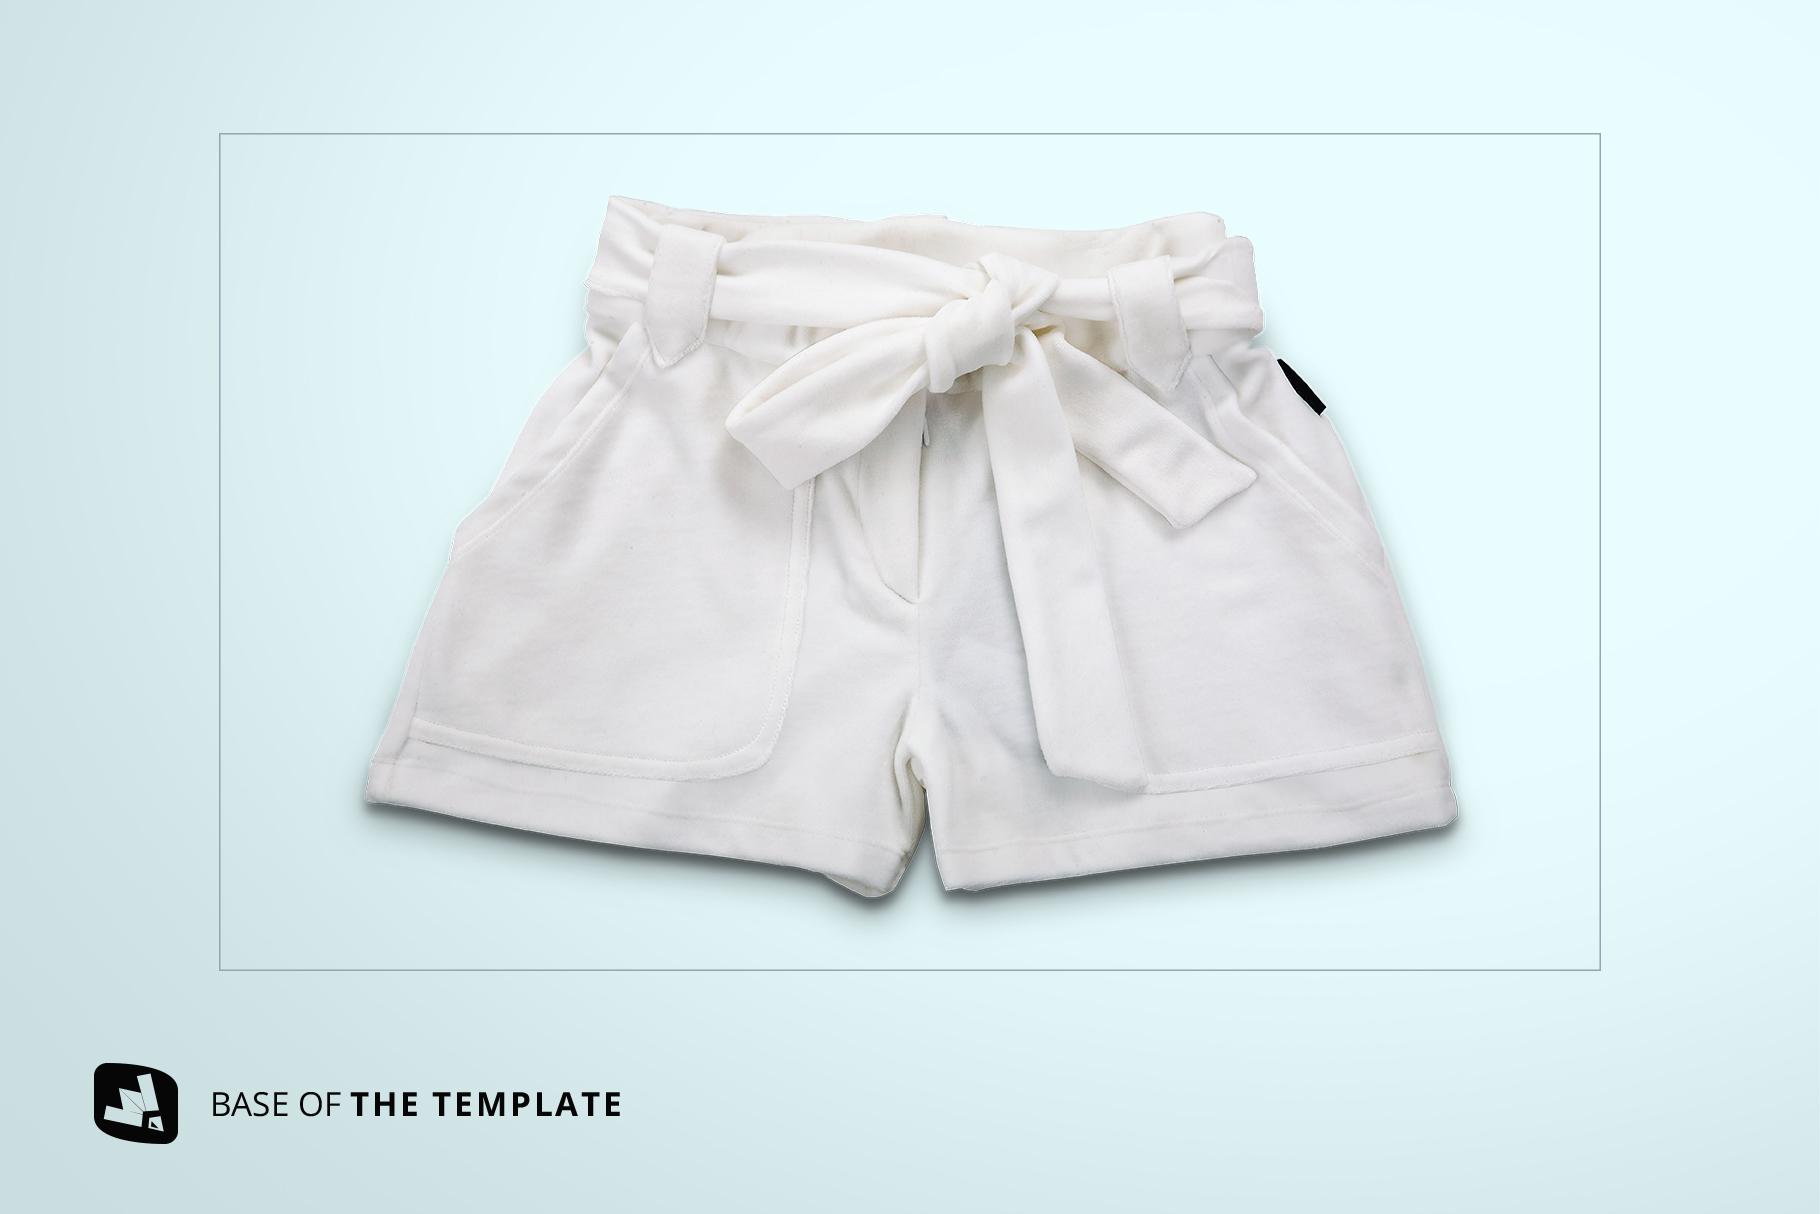 base image of the women's fancy short pants mockup